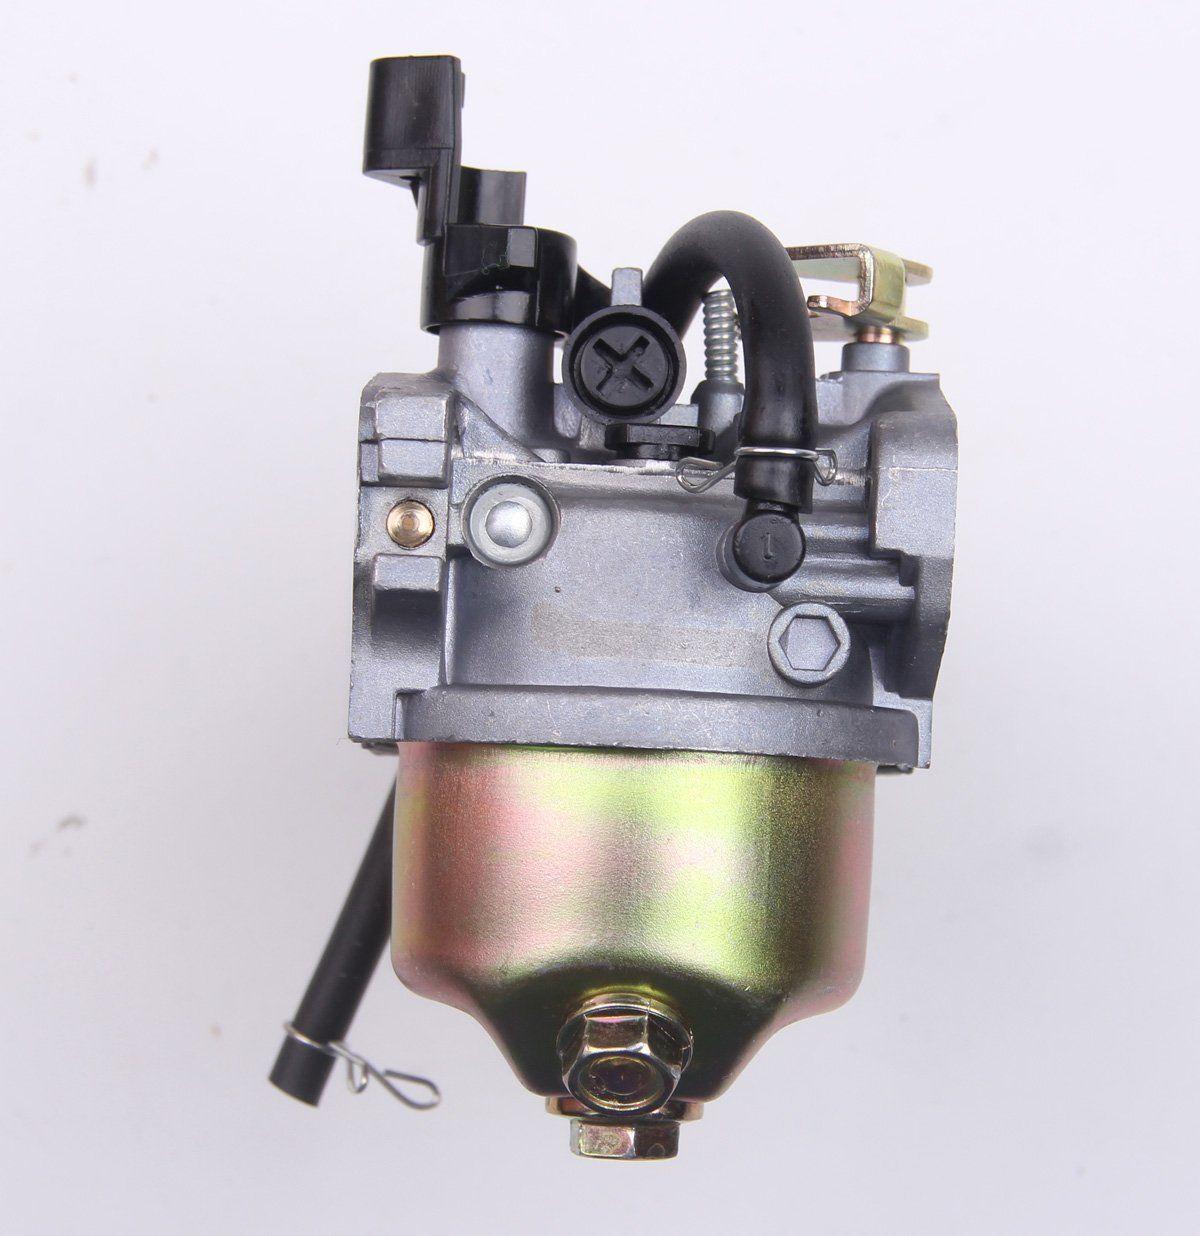 new carburetor with gaskets primer and fuel filter for troy bilt mtd cub cadet snow blower [ 1200 x 1236 Pixel ]